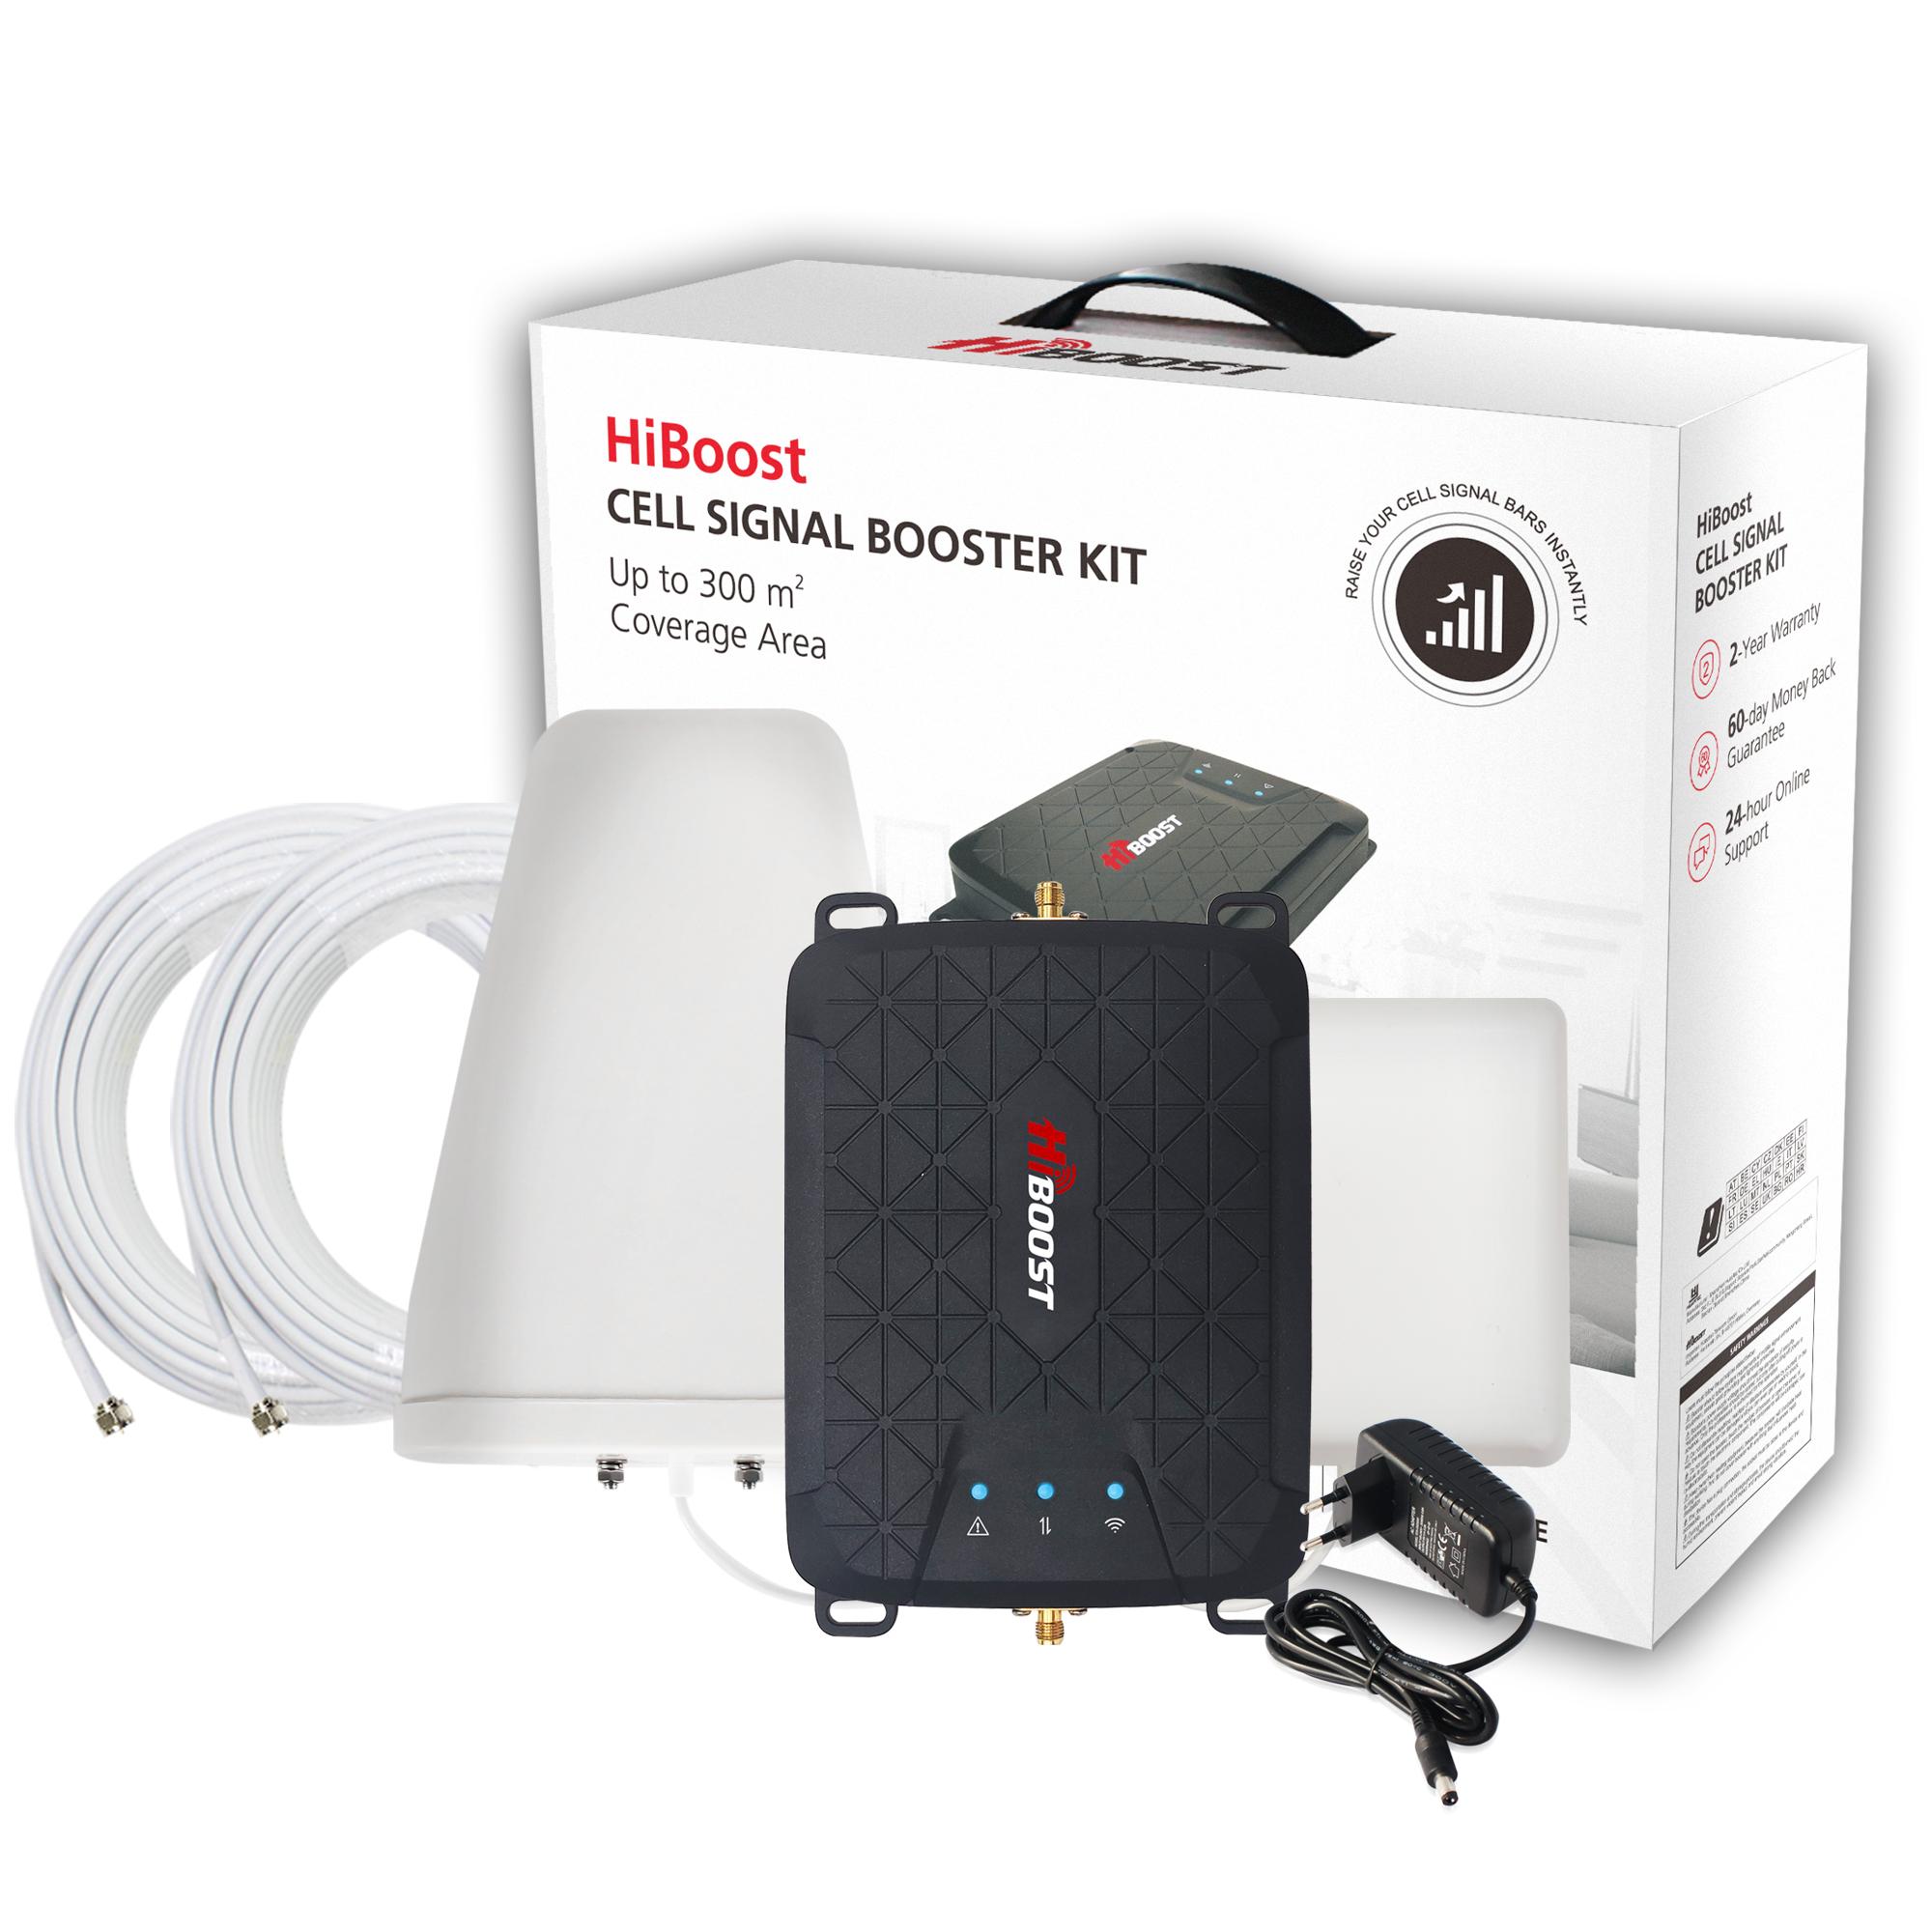 Hi10-5S 2G-4G ALL NETWORKS